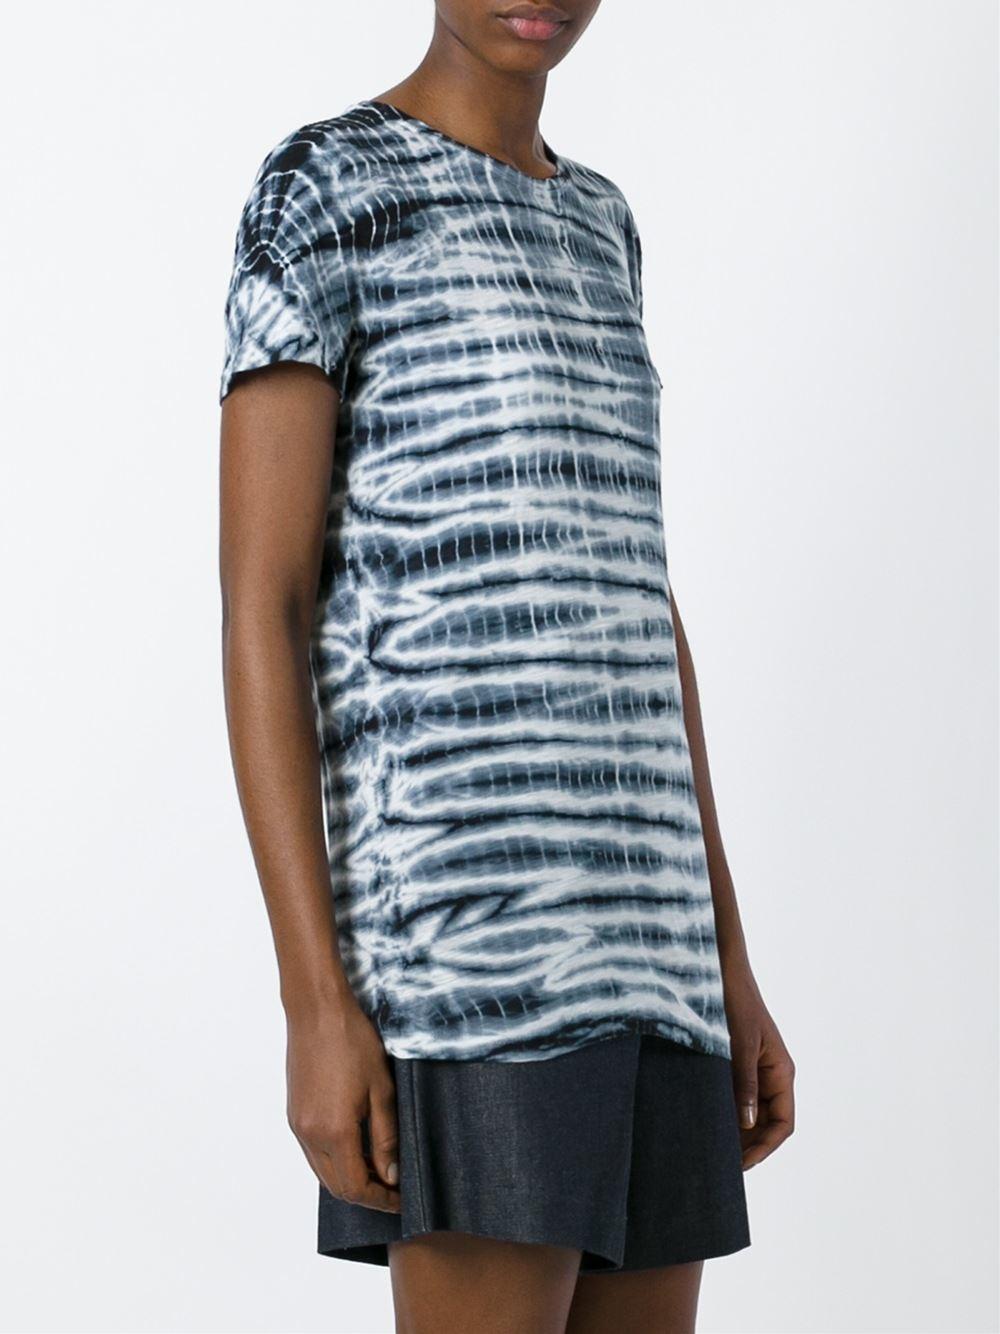 Proenza schouler tie dye t shirt in blue lyst for Black and blue tie dye t shirts